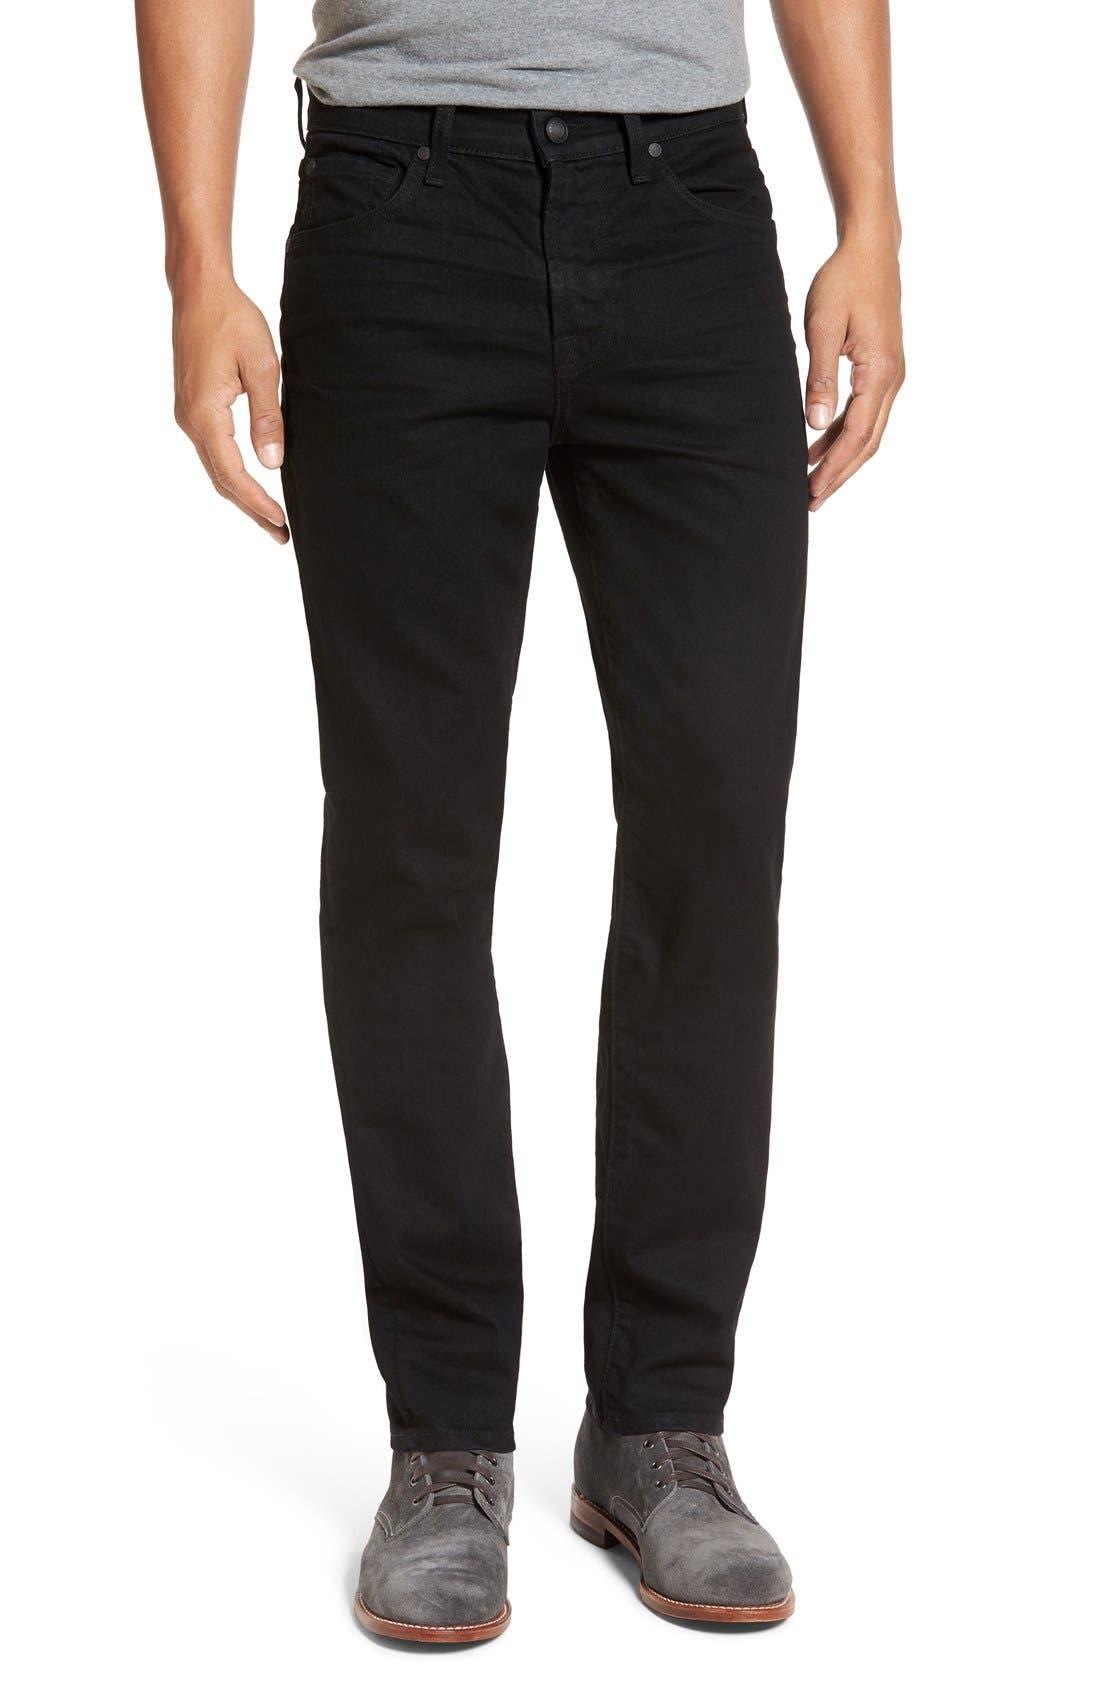 Slimmy Slim Fit Jeans,                         Main,                         color, 004